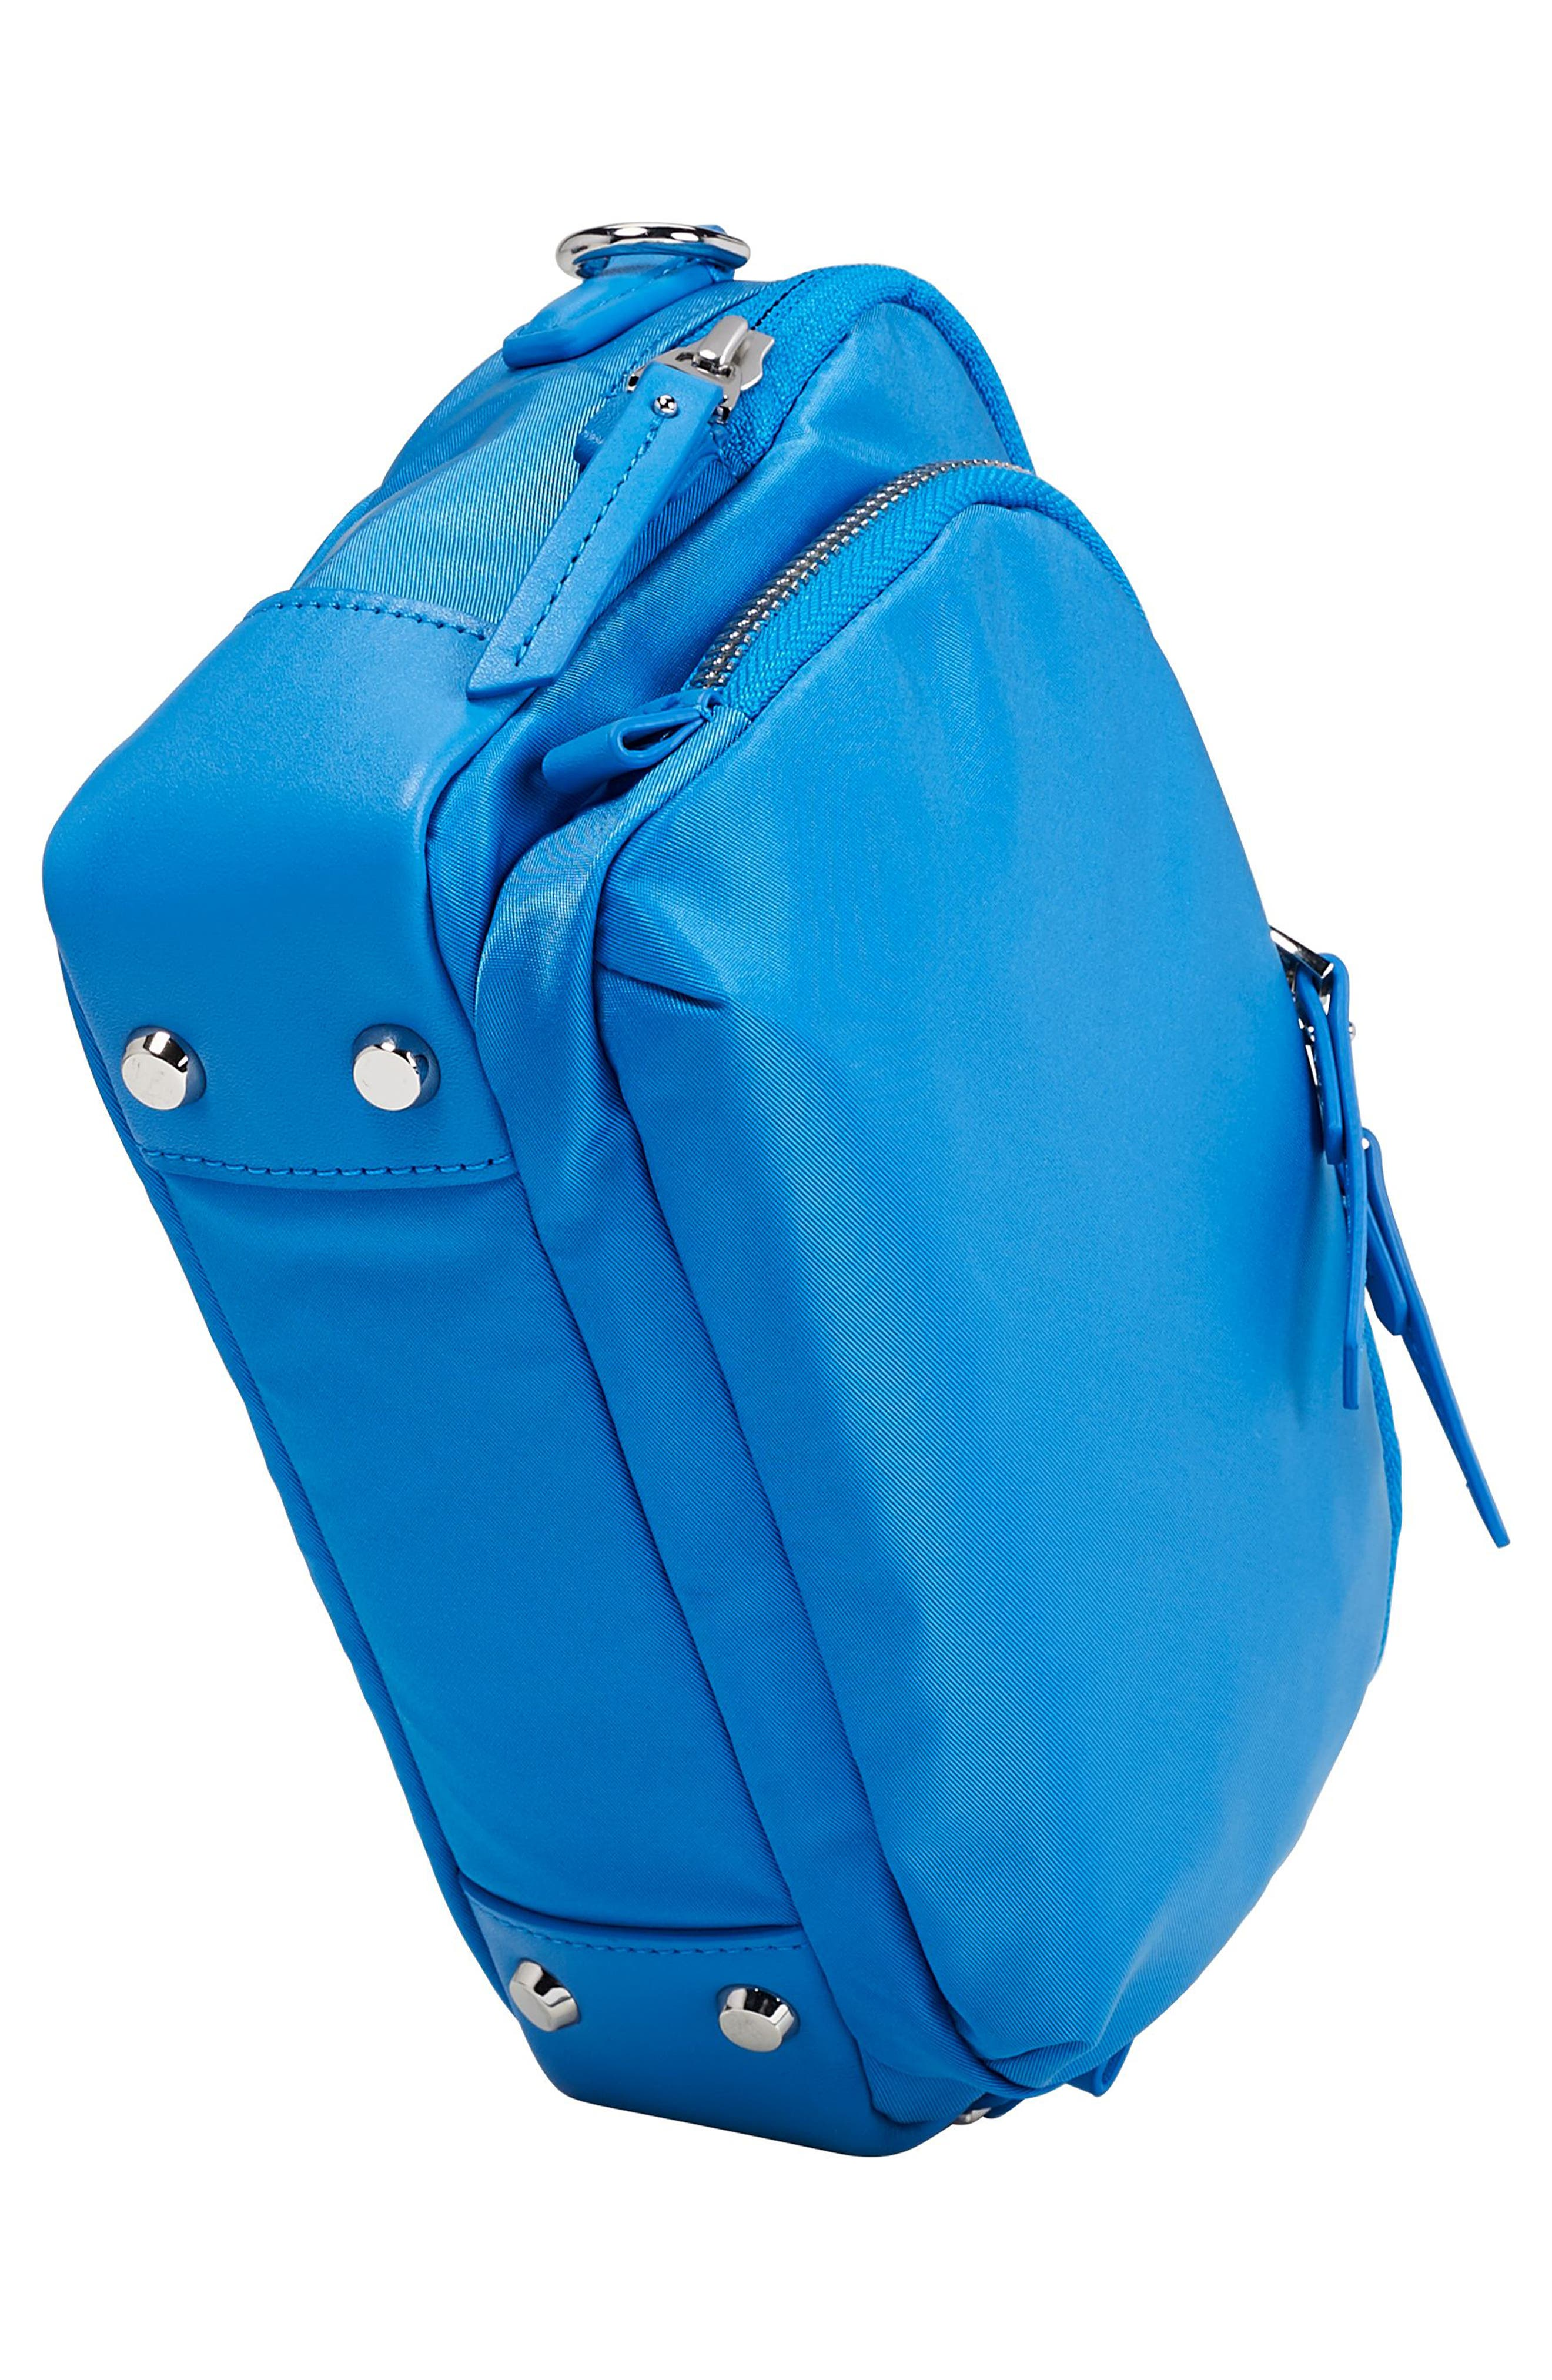 Luanda Crossbody Flight Bag,                             Alternate thumbnail 5, color,                             Bright Blue